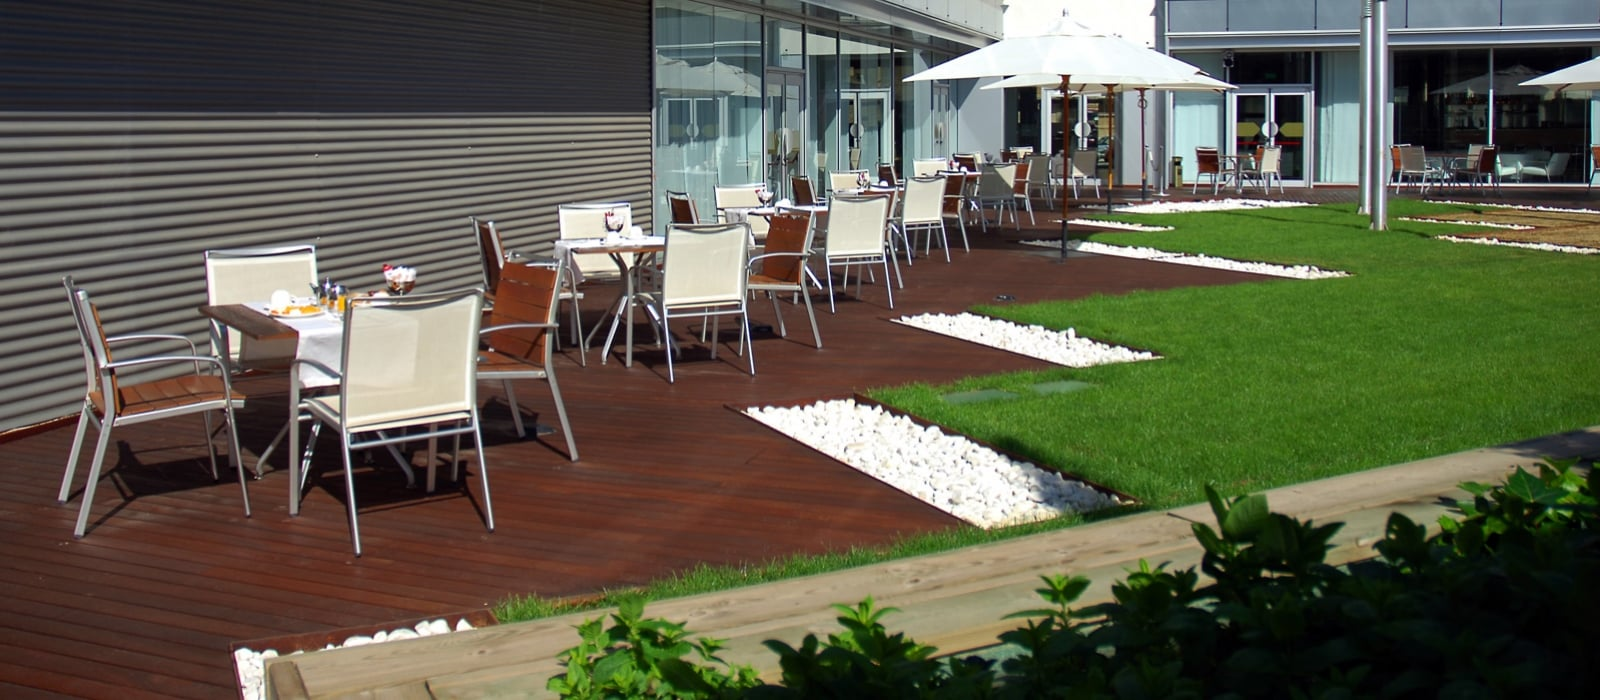 Restaurante jard de mar vincci hoteles - Hoteles vincci barcelona ...